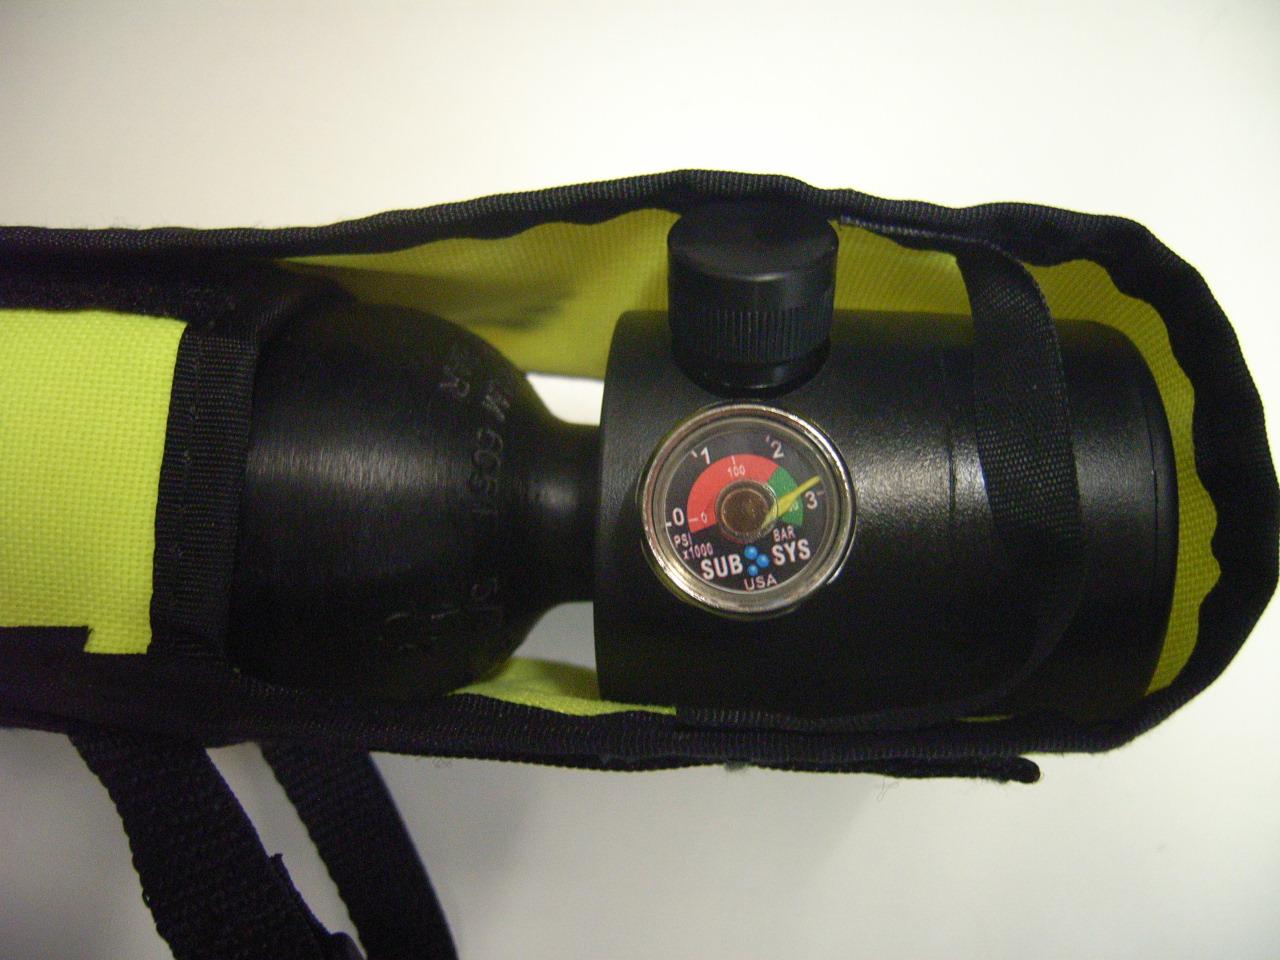 Analog-Manometer für Spare Air